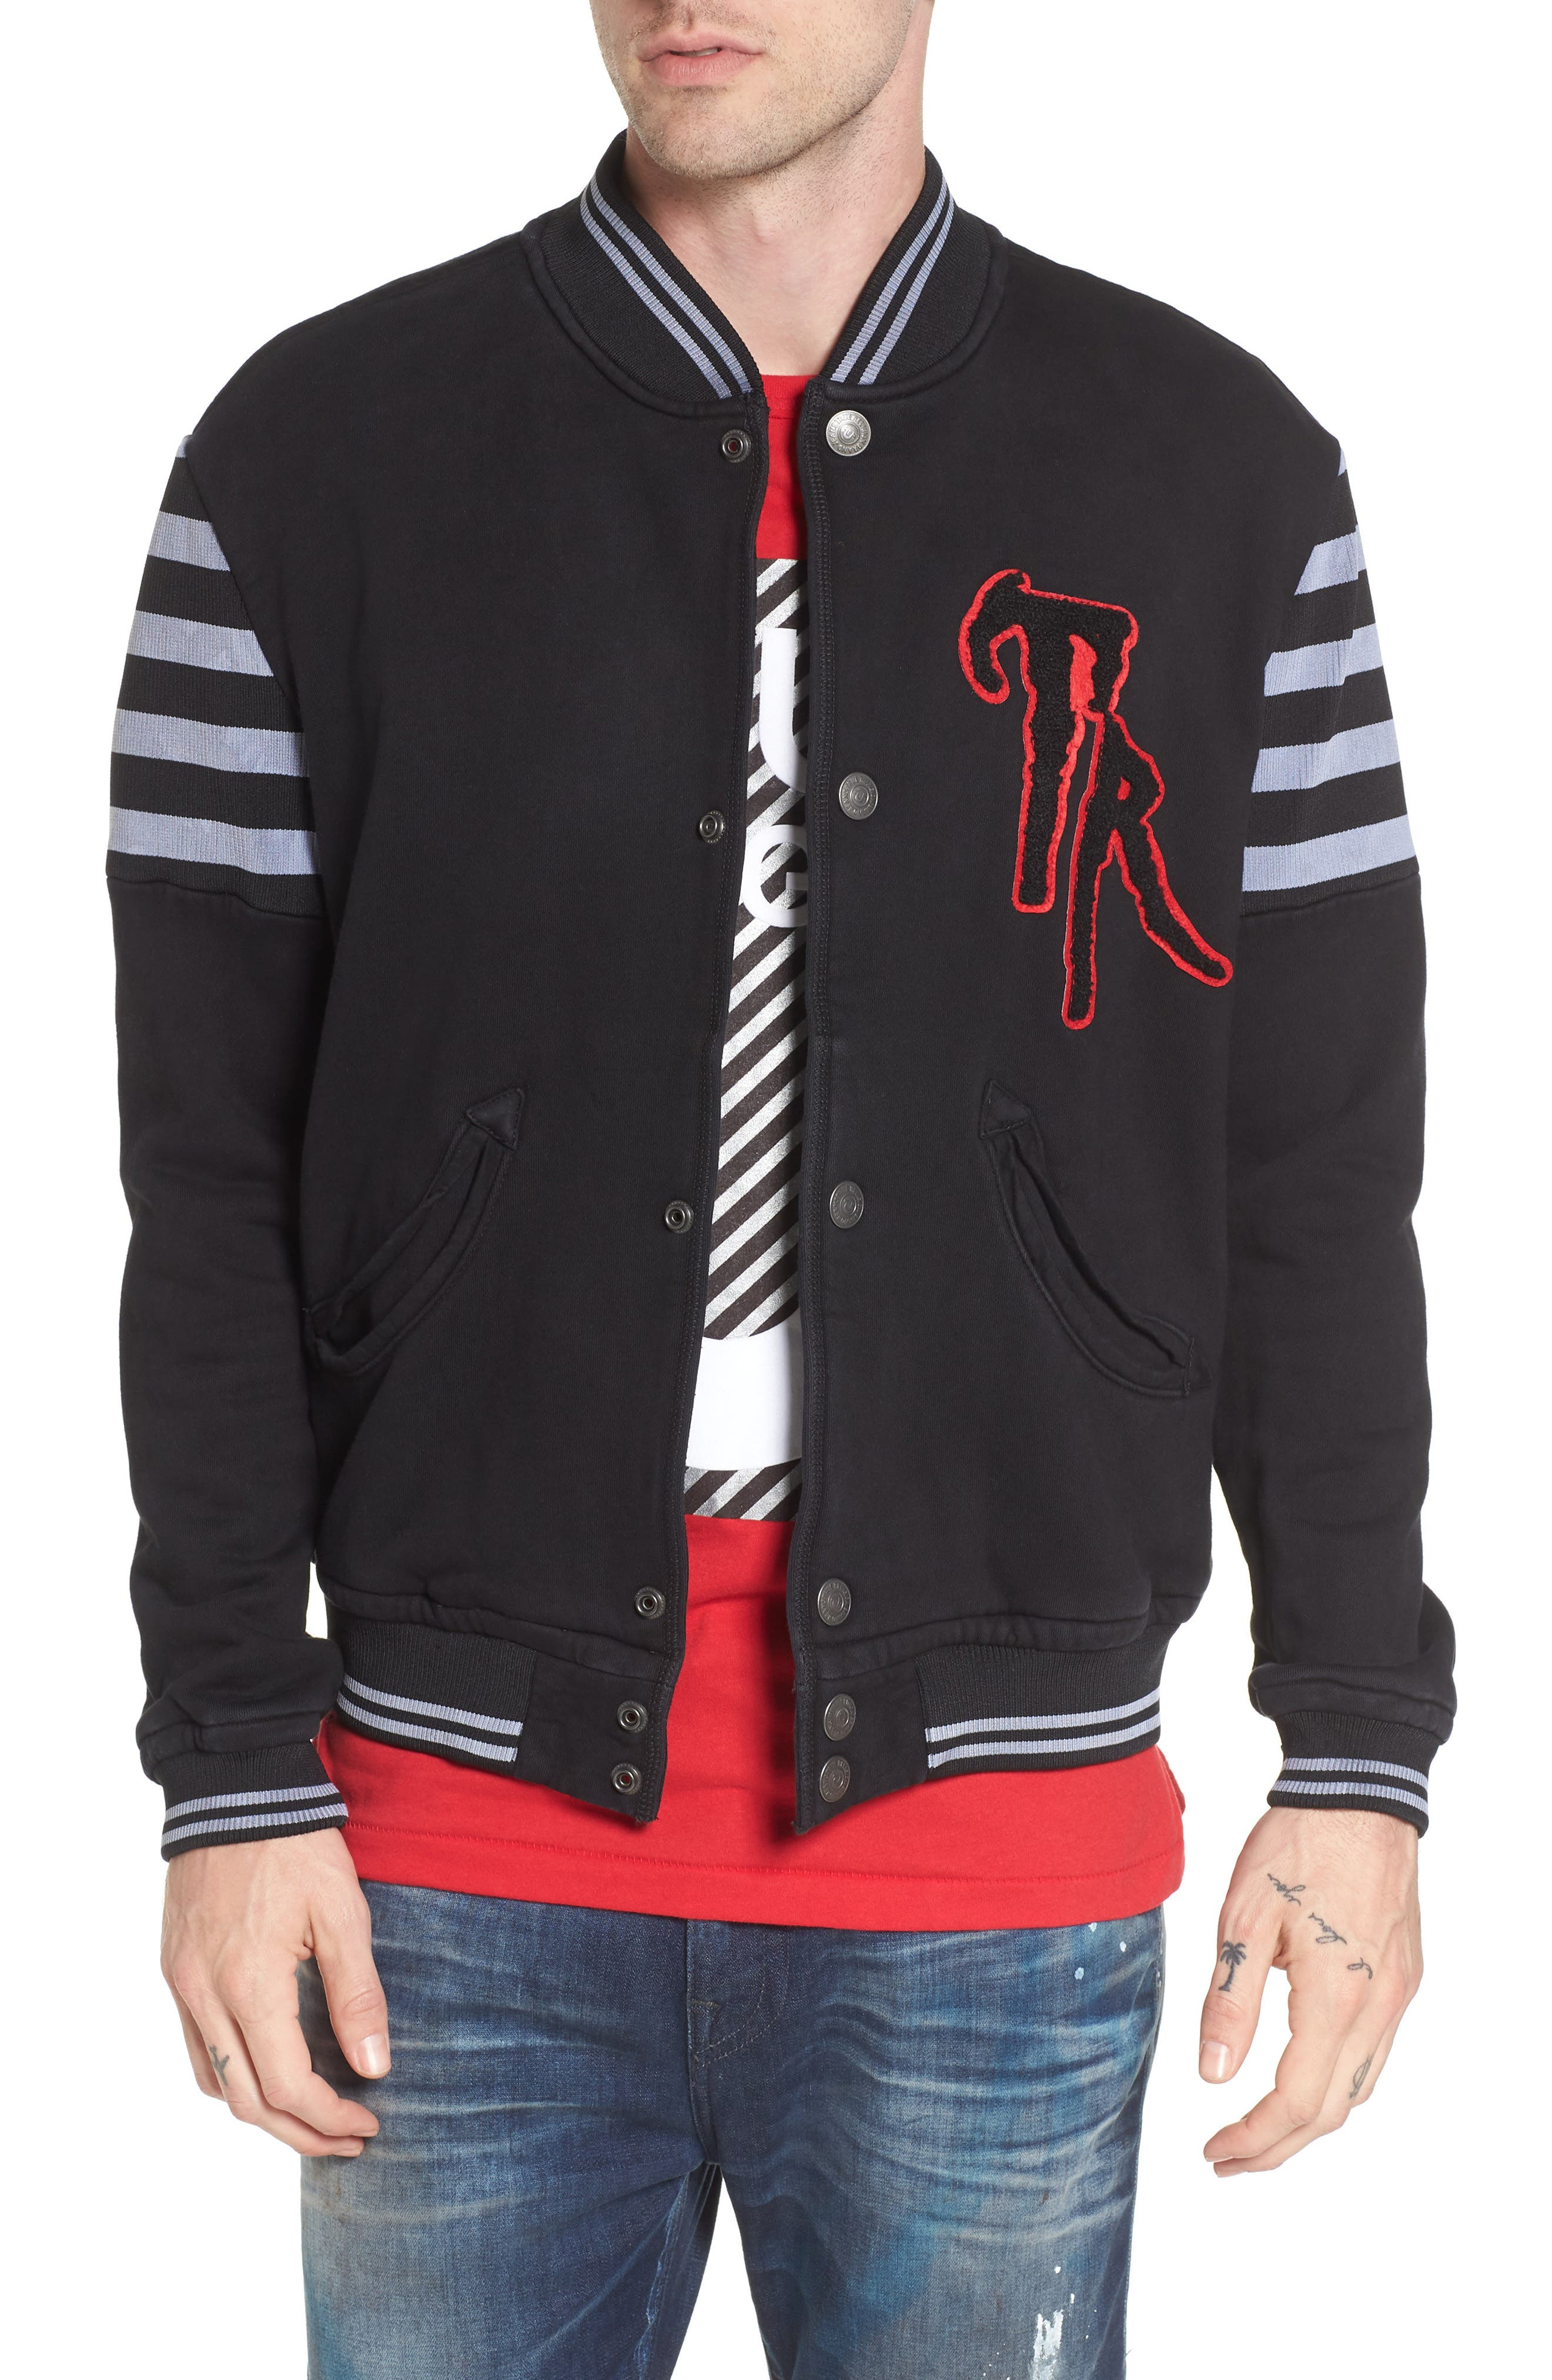 Main Image - True Religion Brand Jeans Collegiate Knit Inset Jacket